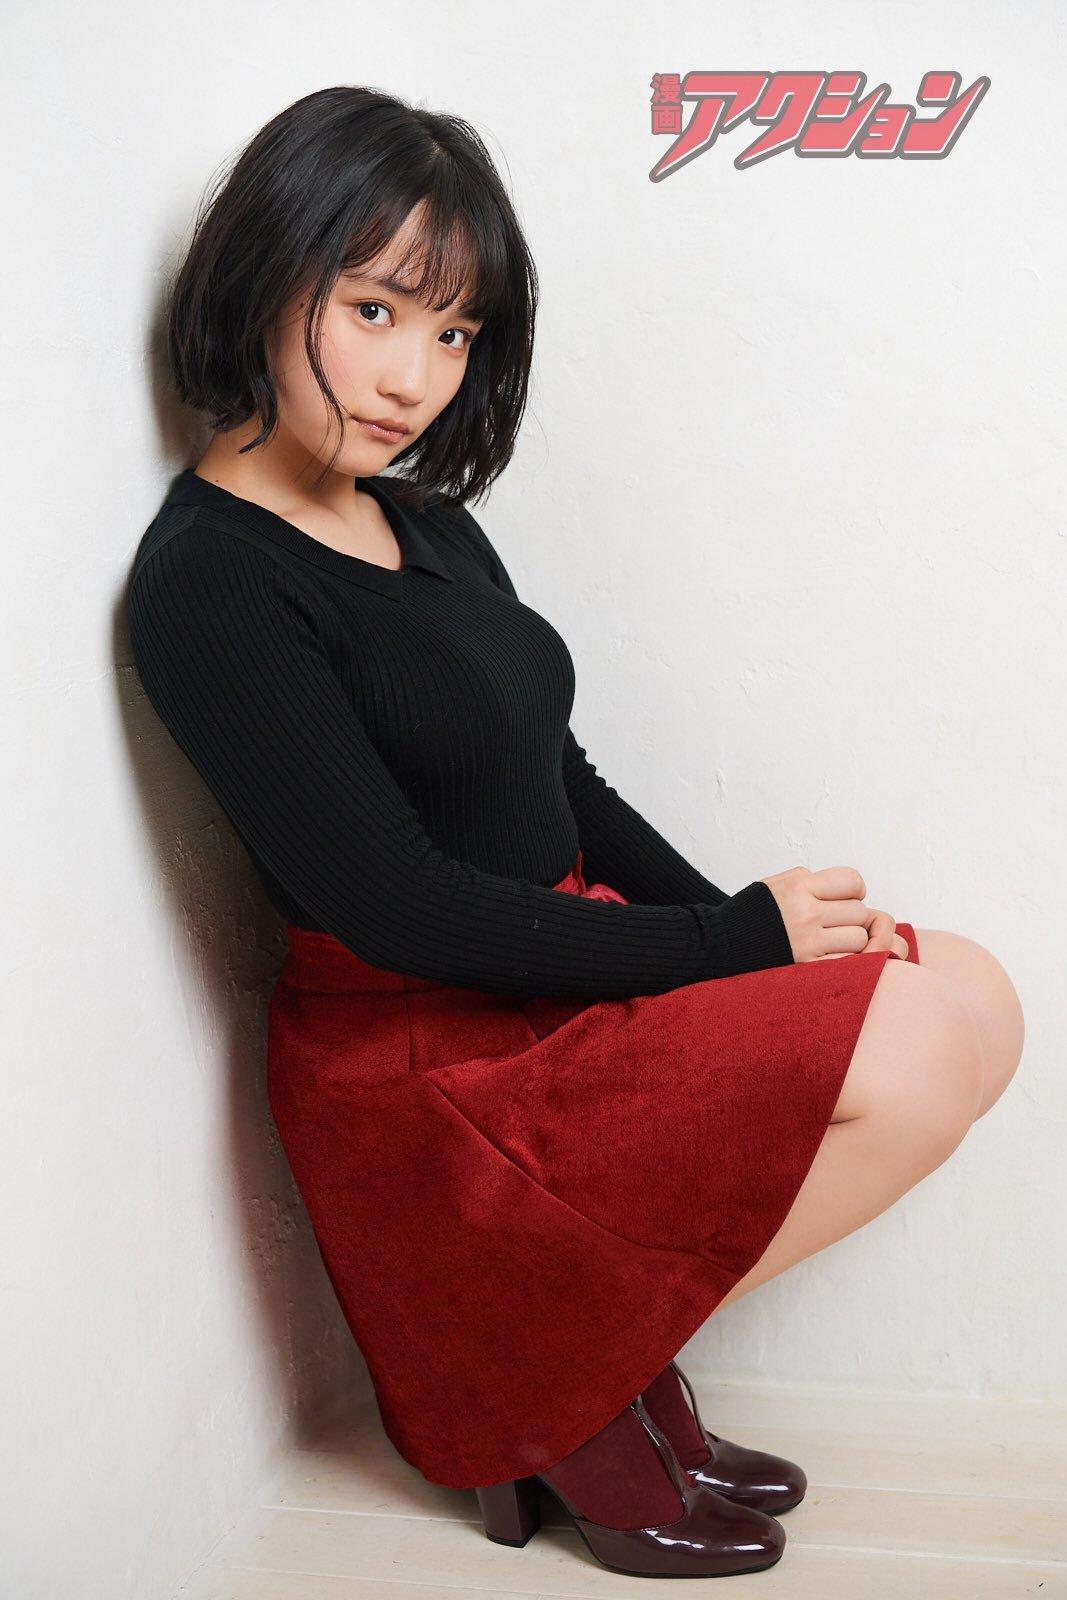 AKB48・矢作萌夏さんのグラビアや週刊文春スキャンダルの画像-222